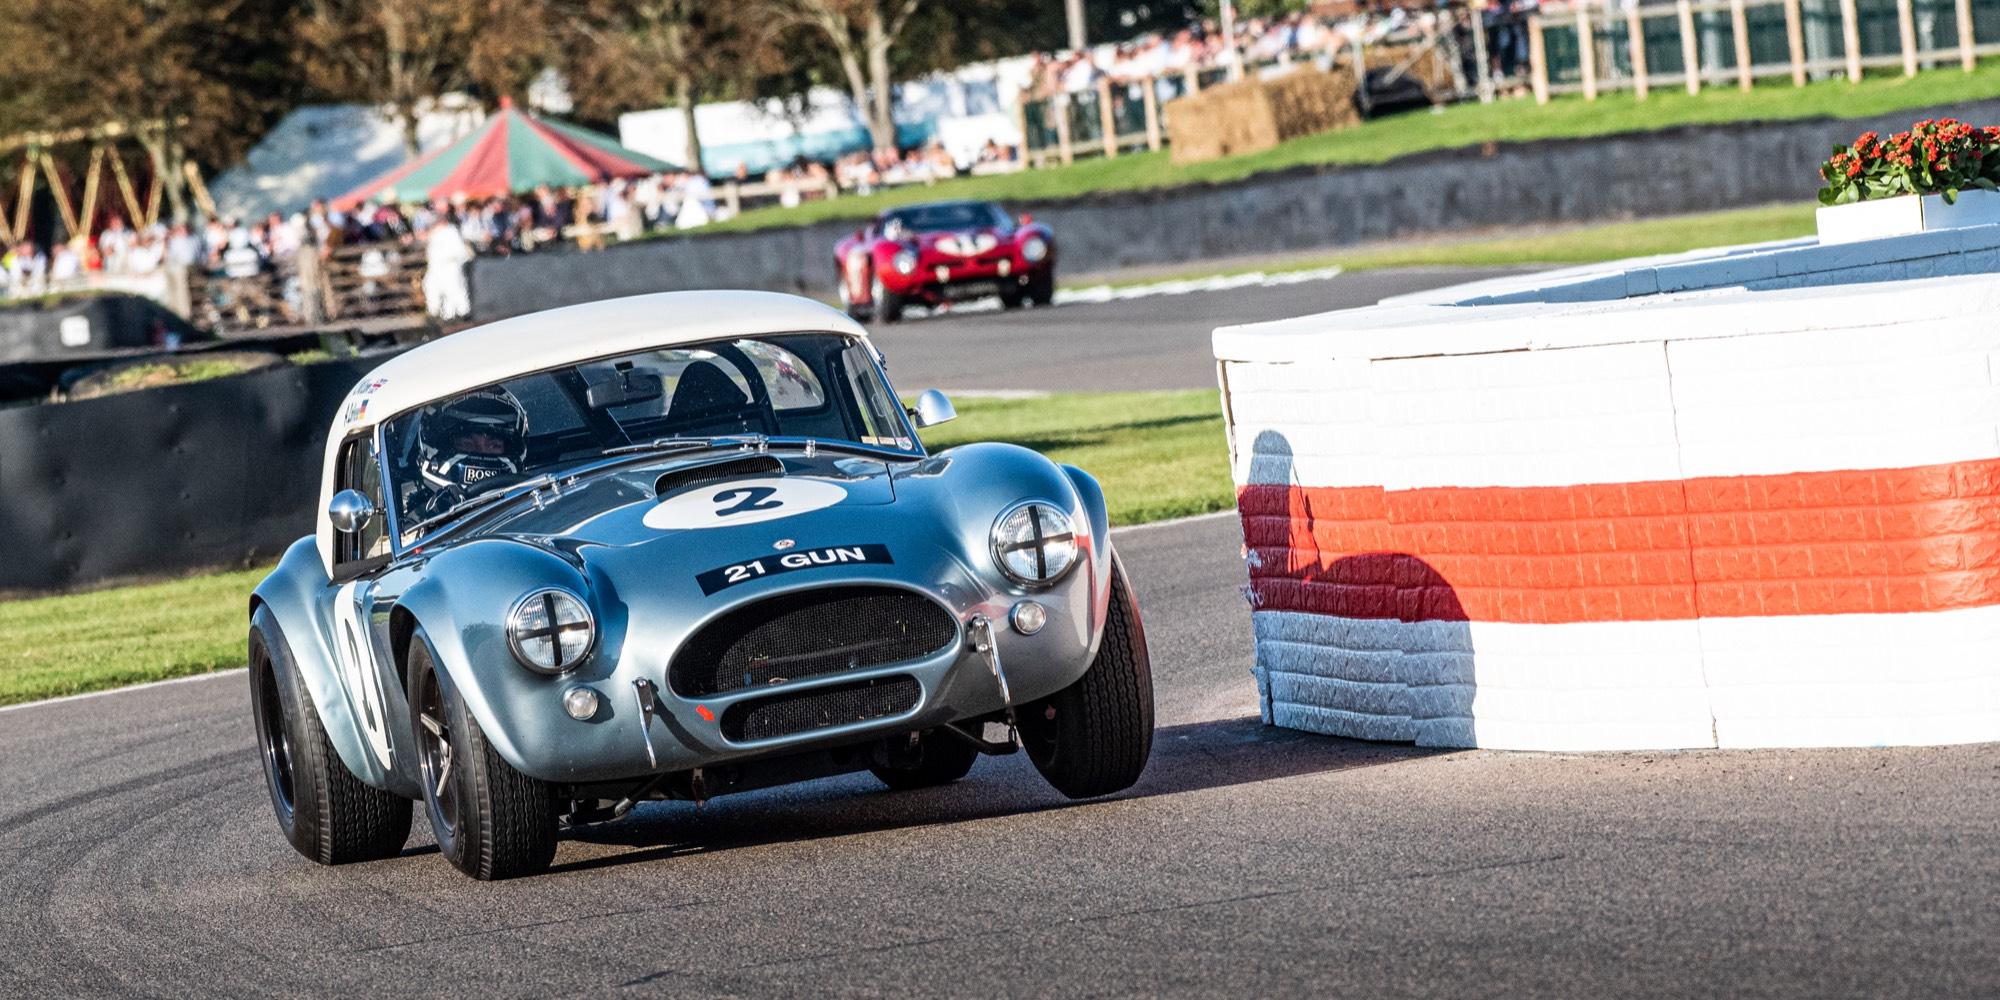 The 2019 Goodwood Revival RAC TT Winning 1965 AC Cobra Mk1 289